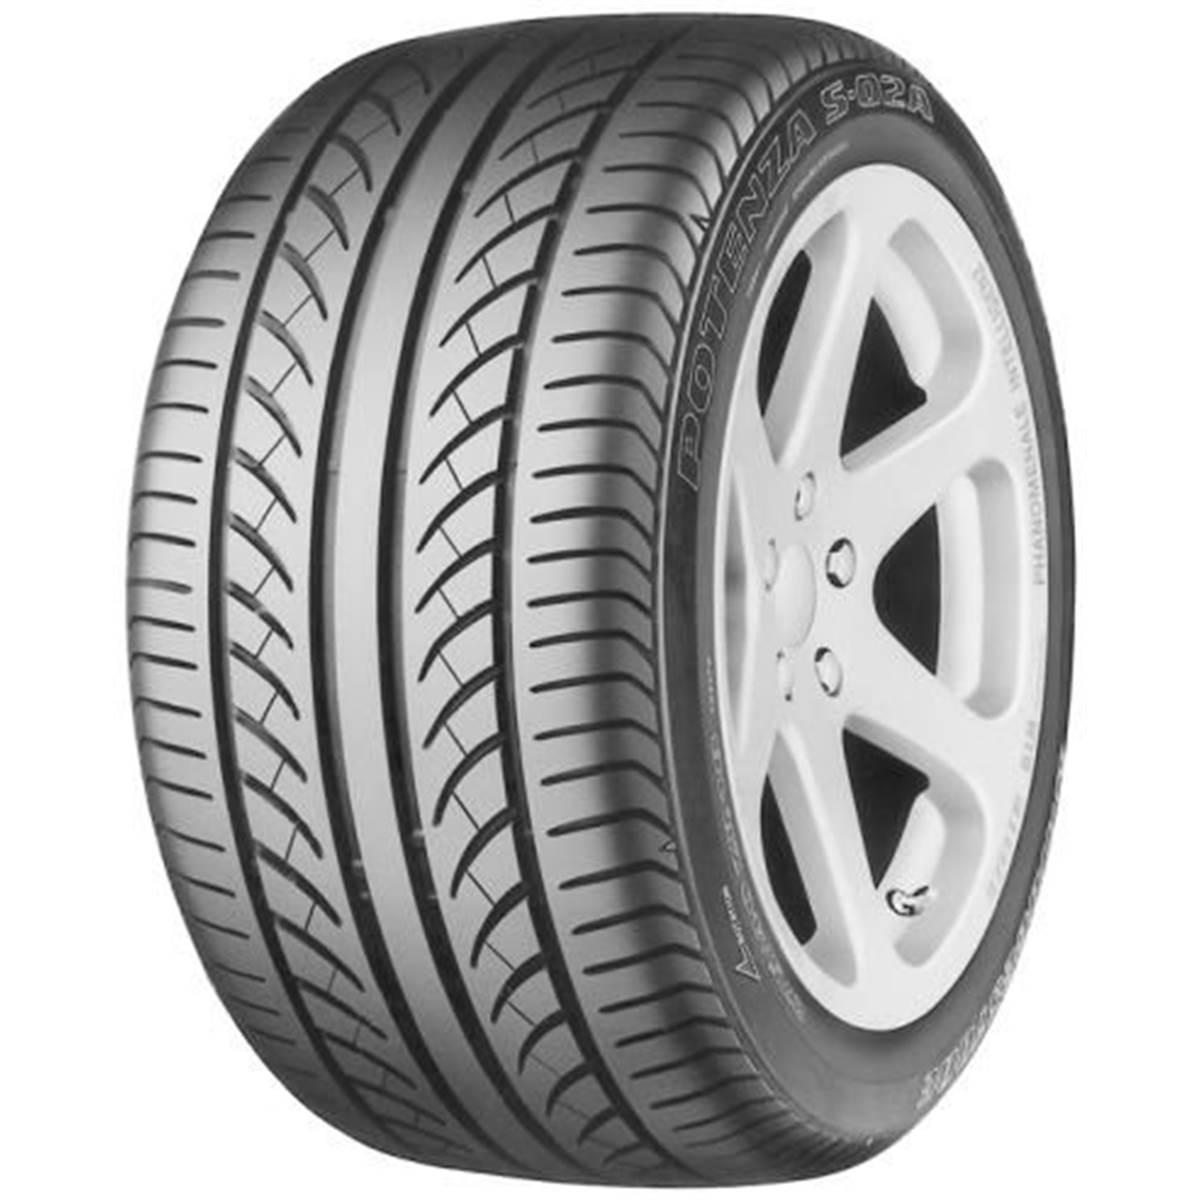 Pneu Bridgestone 205/50R17 Z Potenza S02A